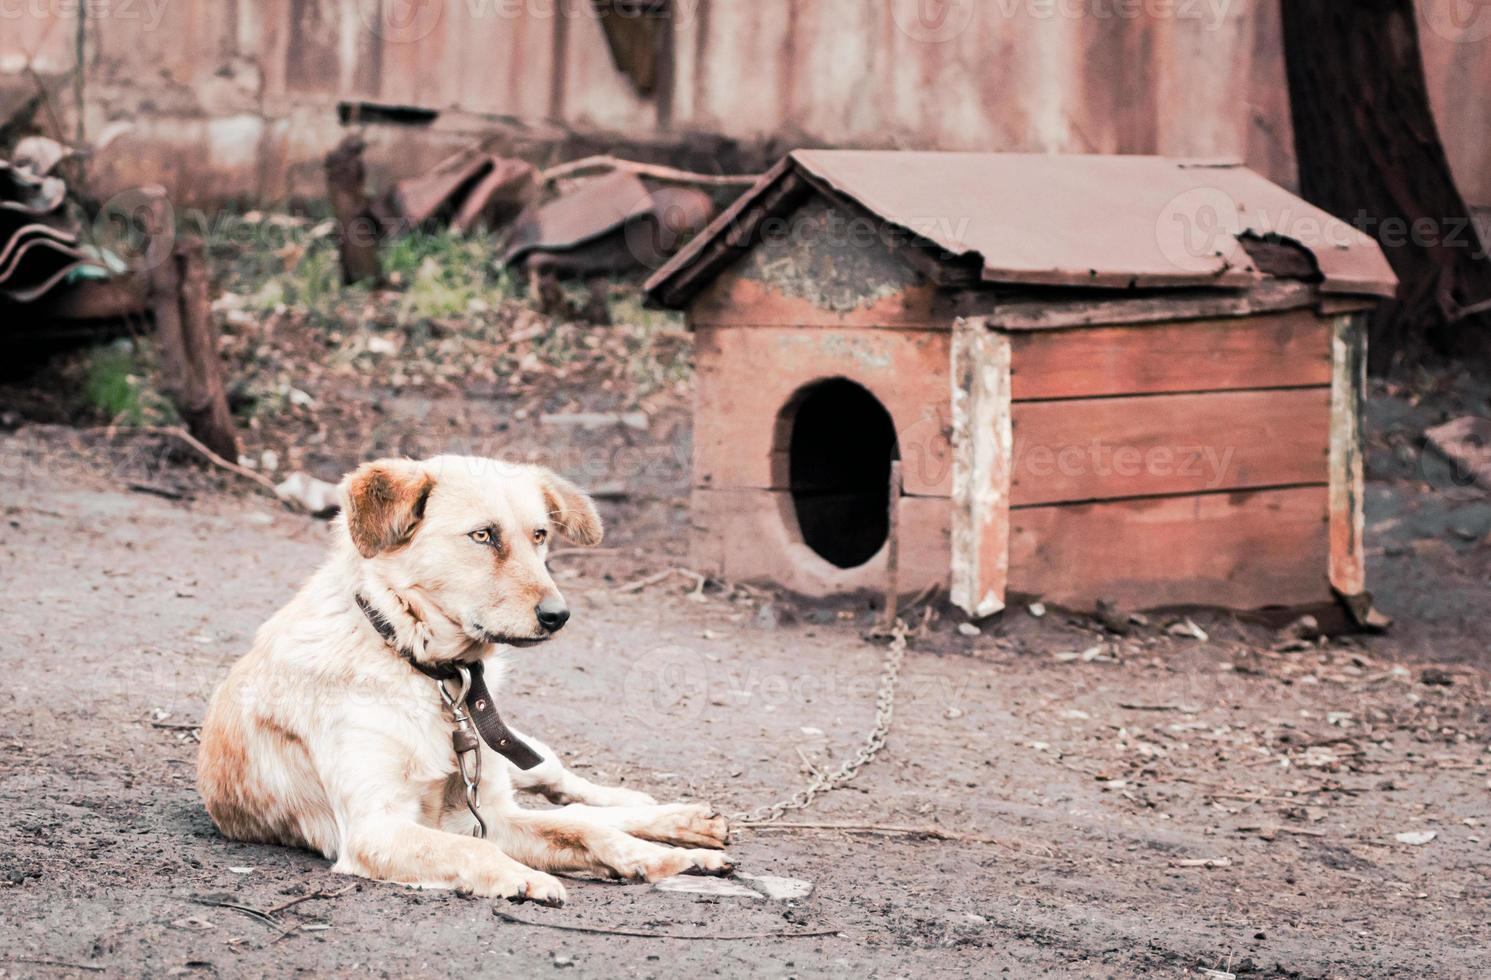 perro con una caseta de perro foto